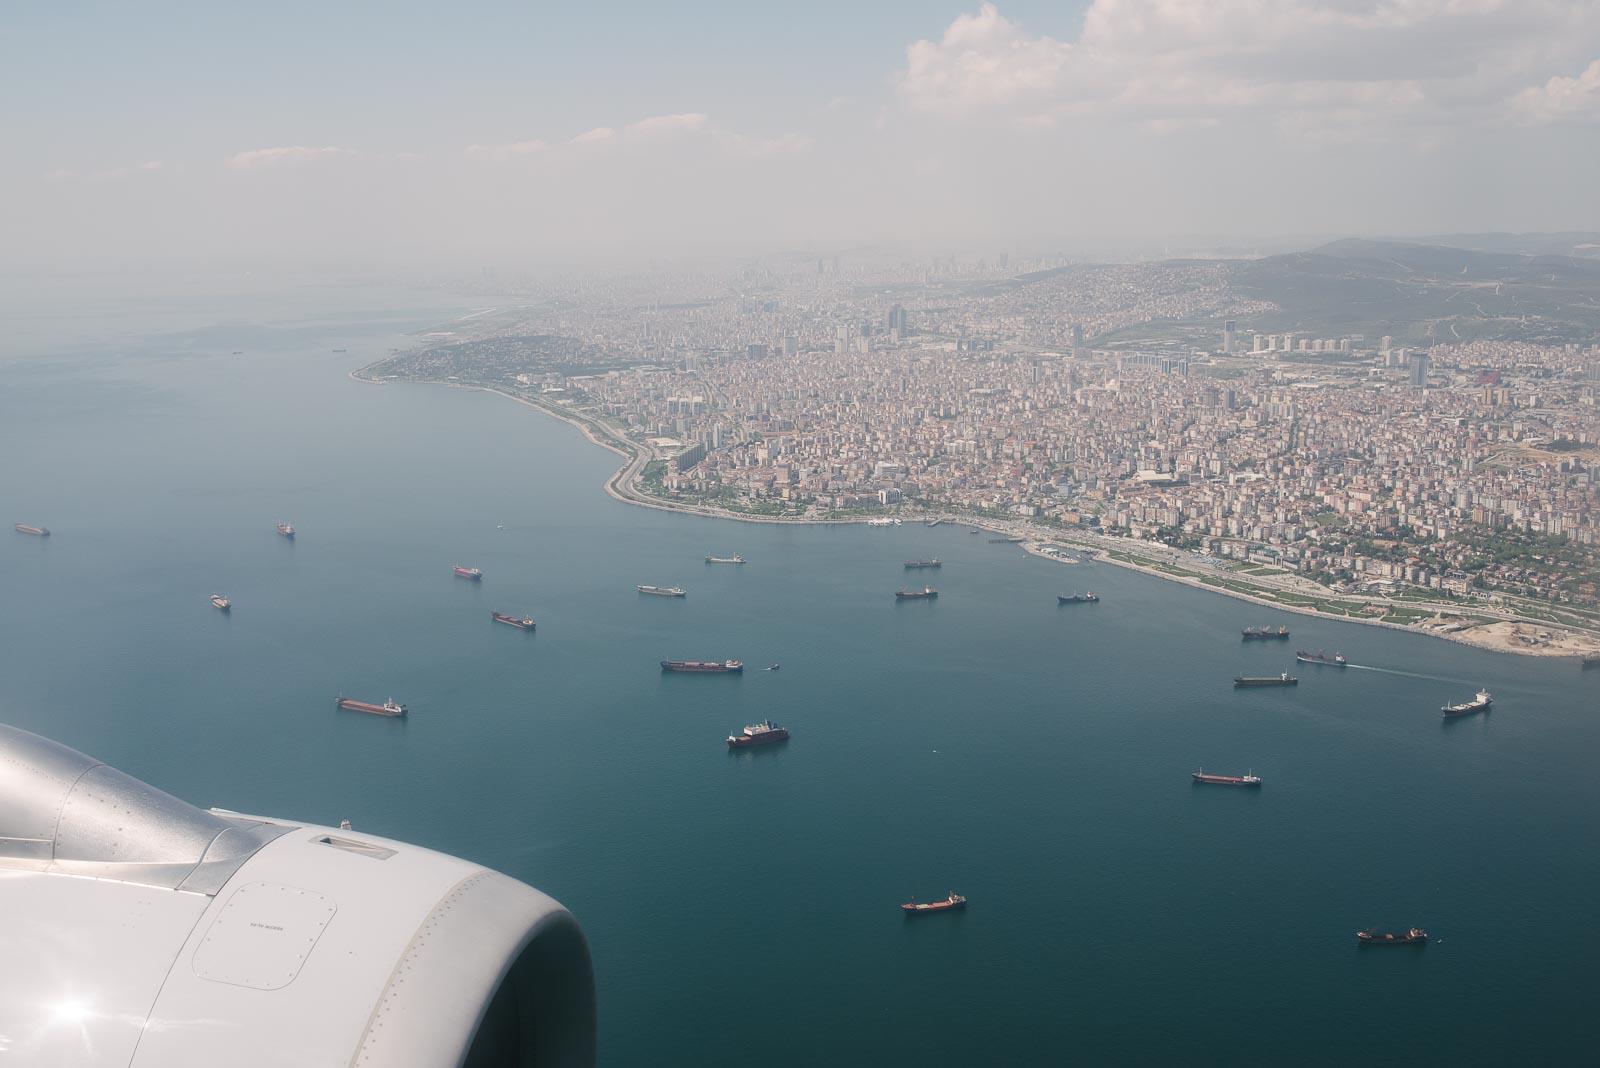 Anflug germanwings Istanbul Sabiha